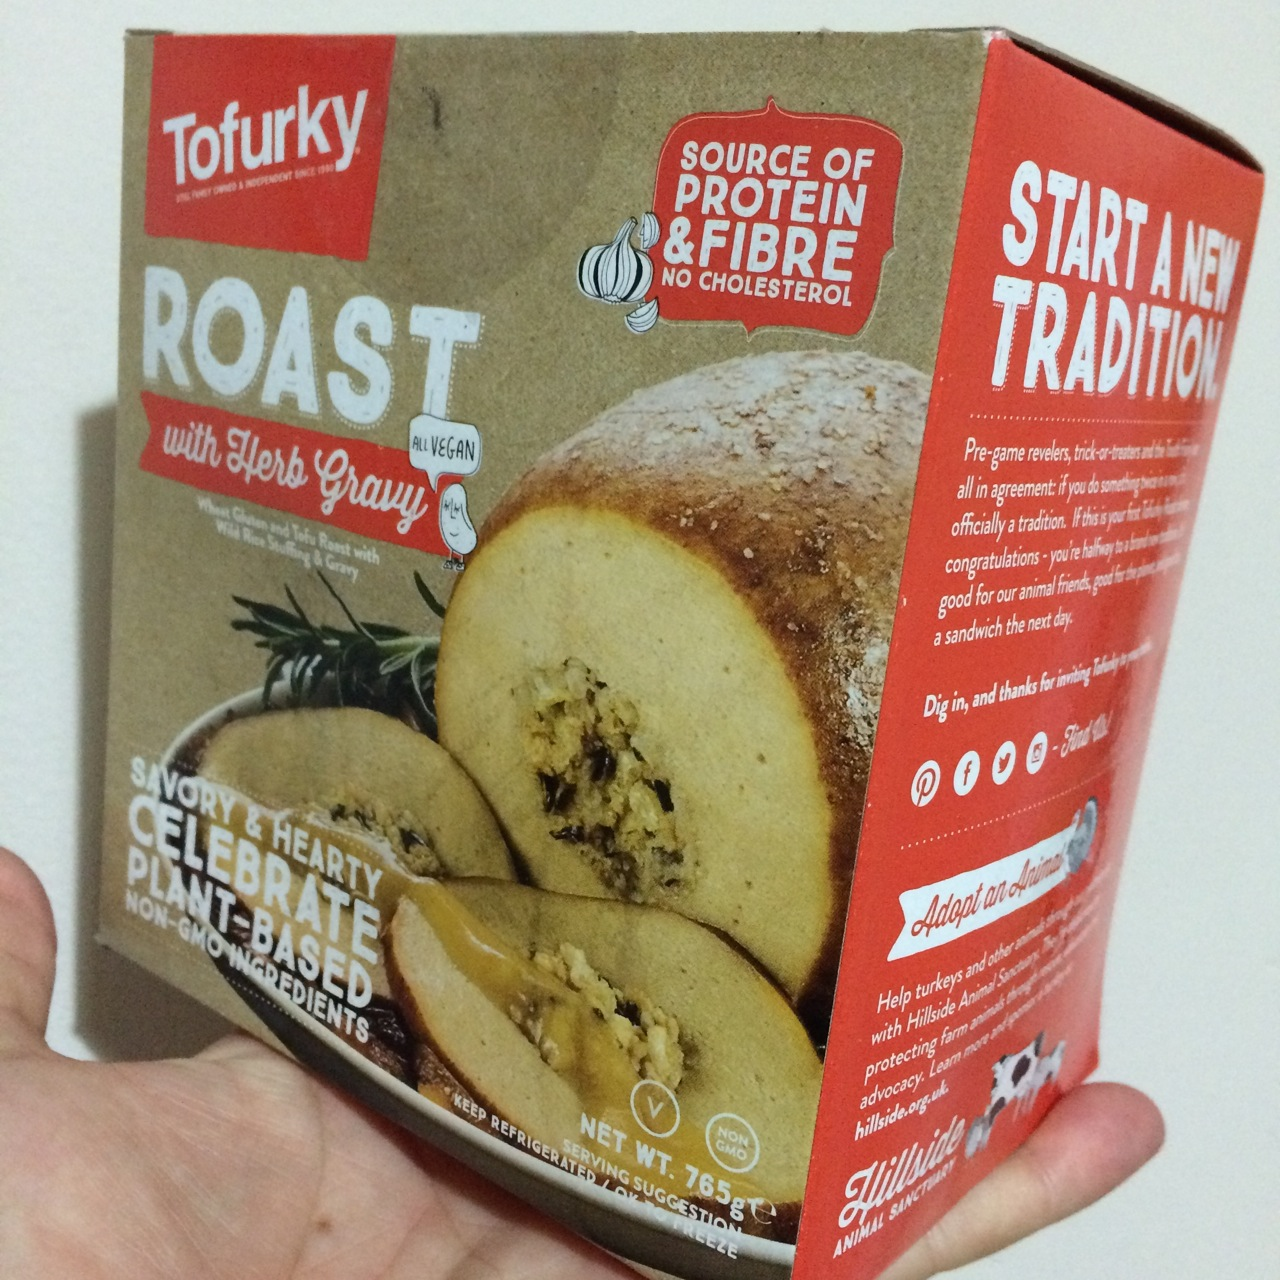 http://i2.wp.com/fatgayvegan.com/wp-content/uploads/2015/11/Tofurky-Roast-with-Herb-Gravy.jpg?fit=1280%2C1280